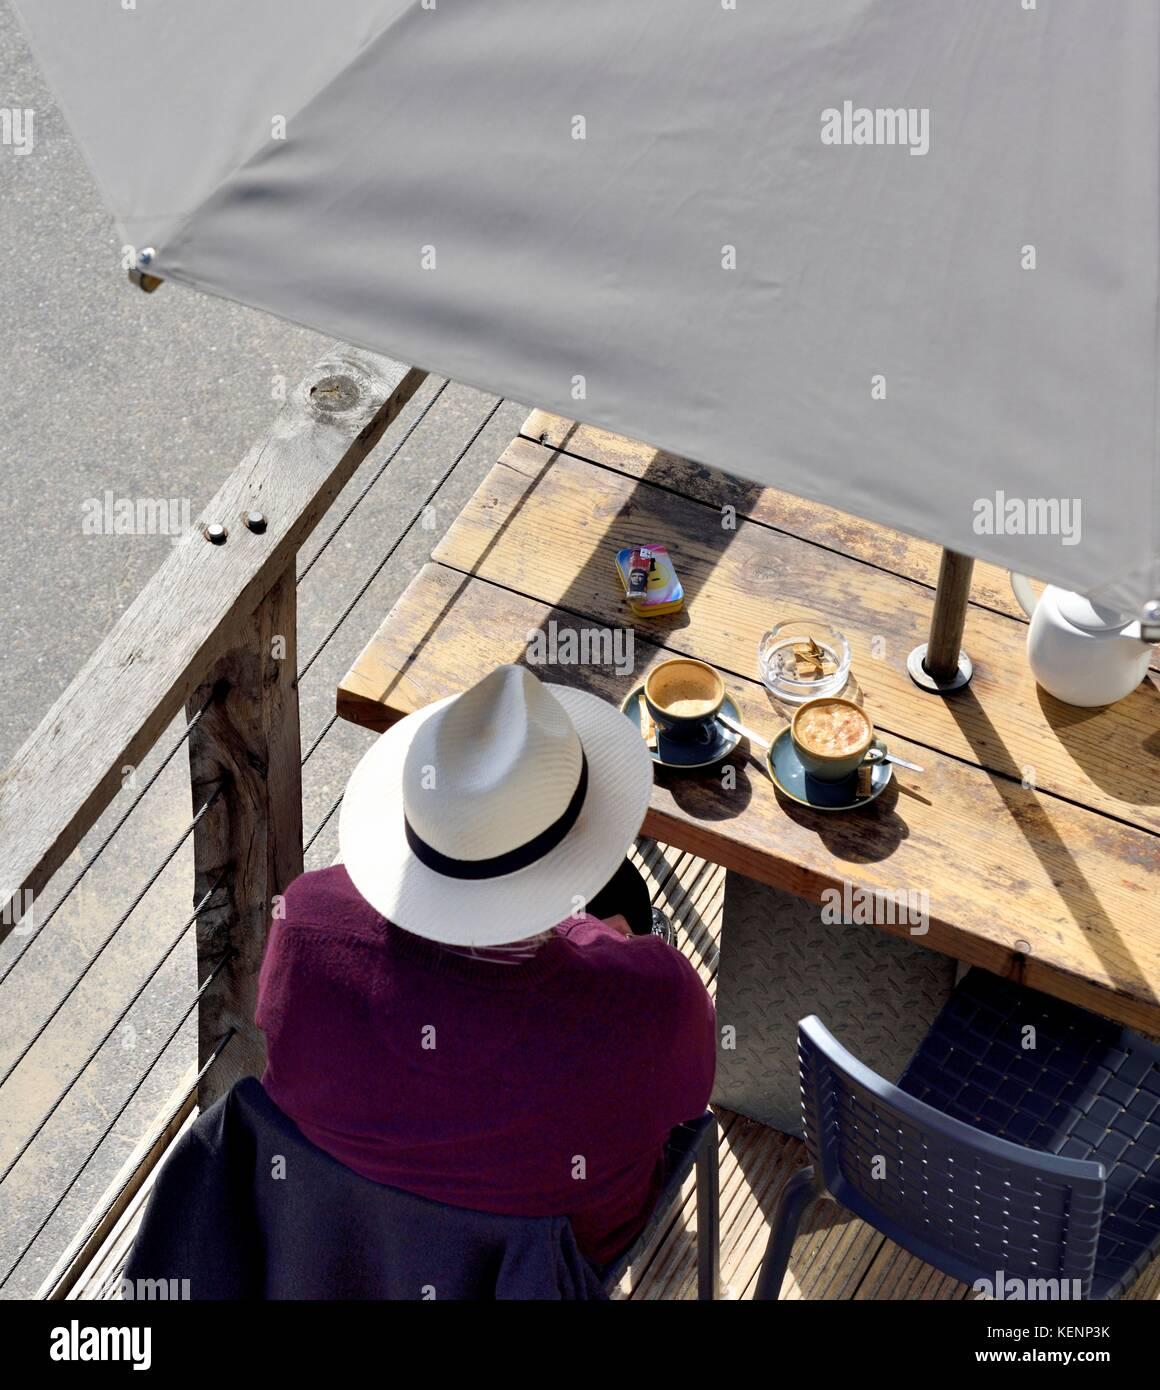 e2e01dd3cbf7f Un hombre que llevaba un sombrero de Panamá sentado con una taza de café  frente al